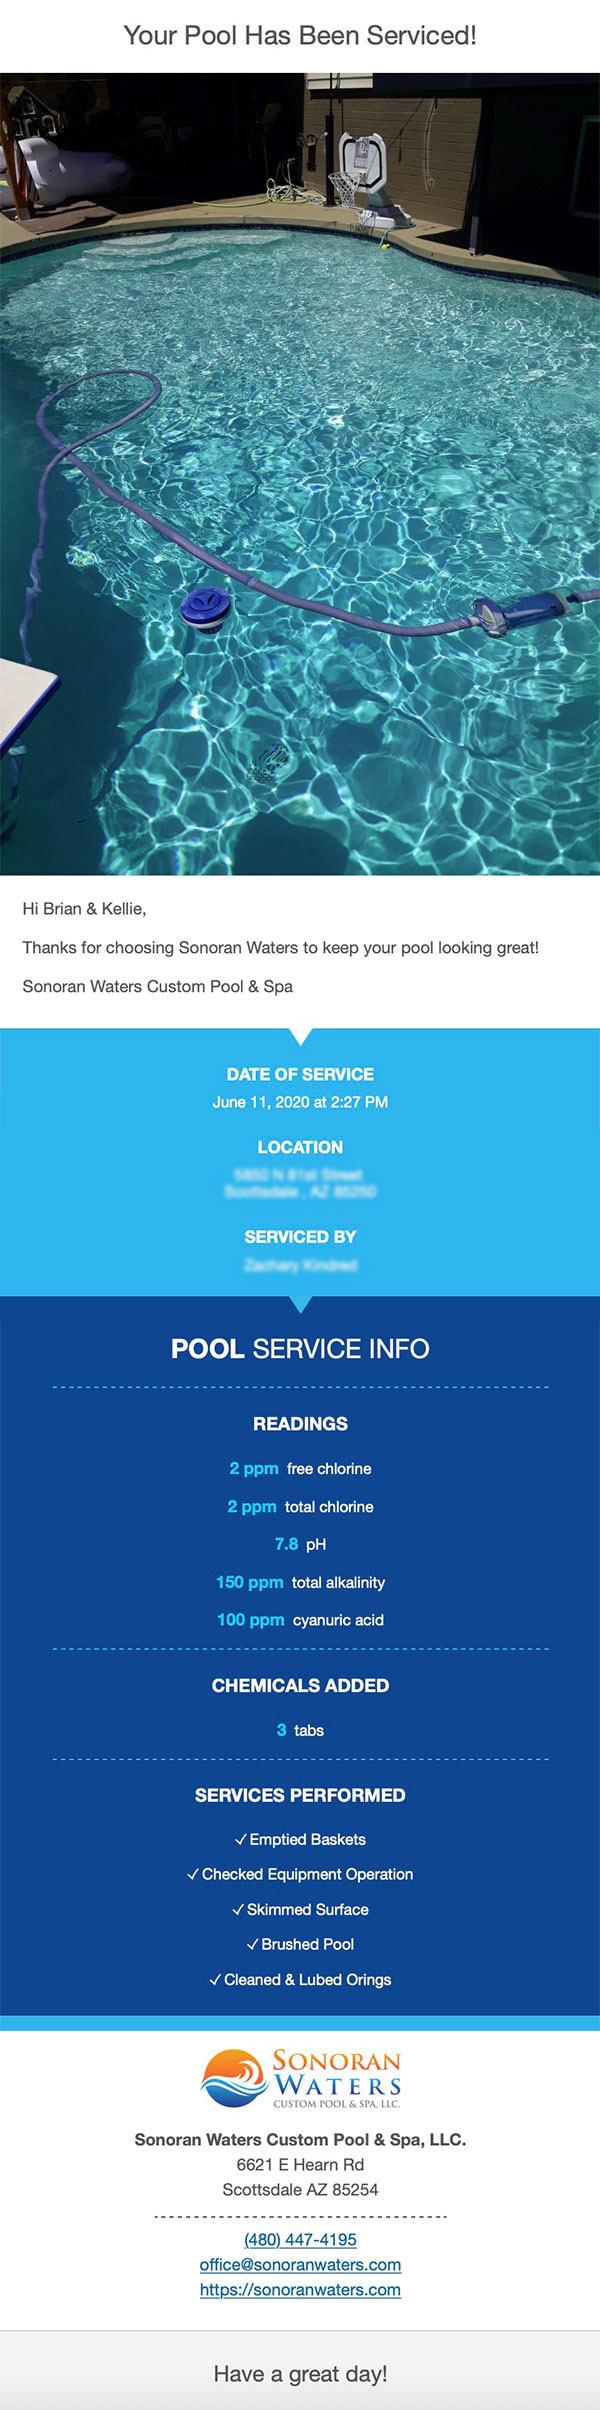 weekly pool service report - sonoran waters